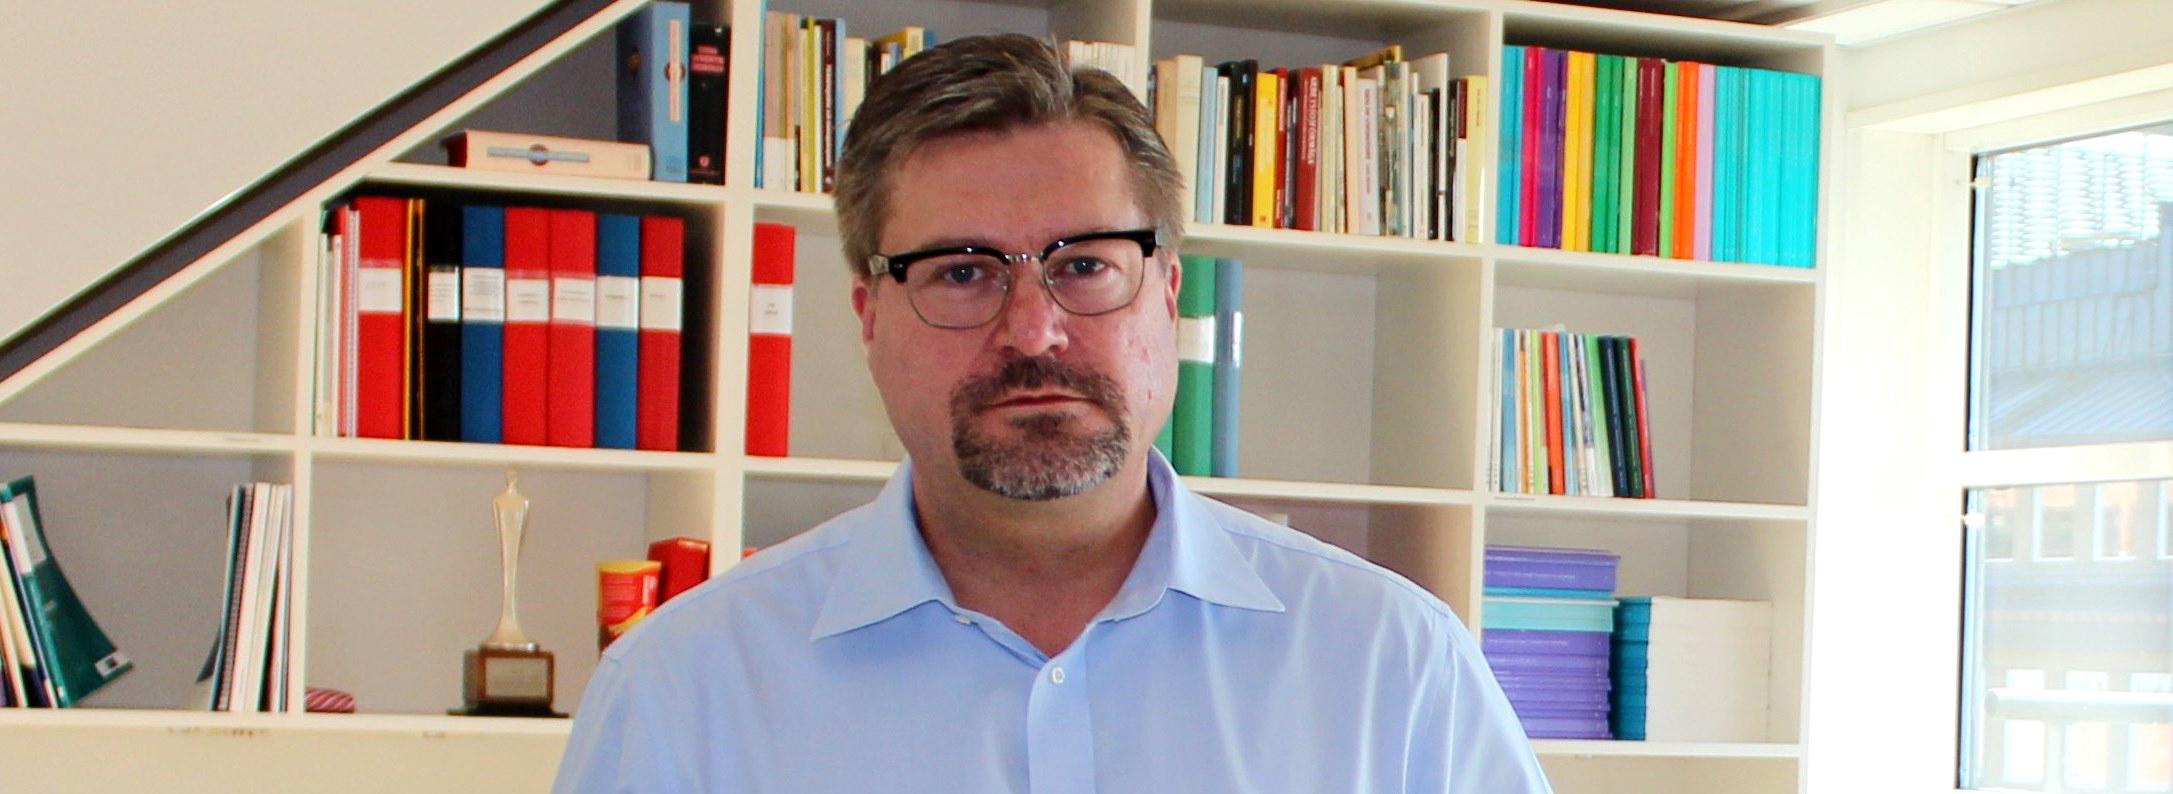 Mikael Sjöberg: rebuilding trust in the Public Employment Service